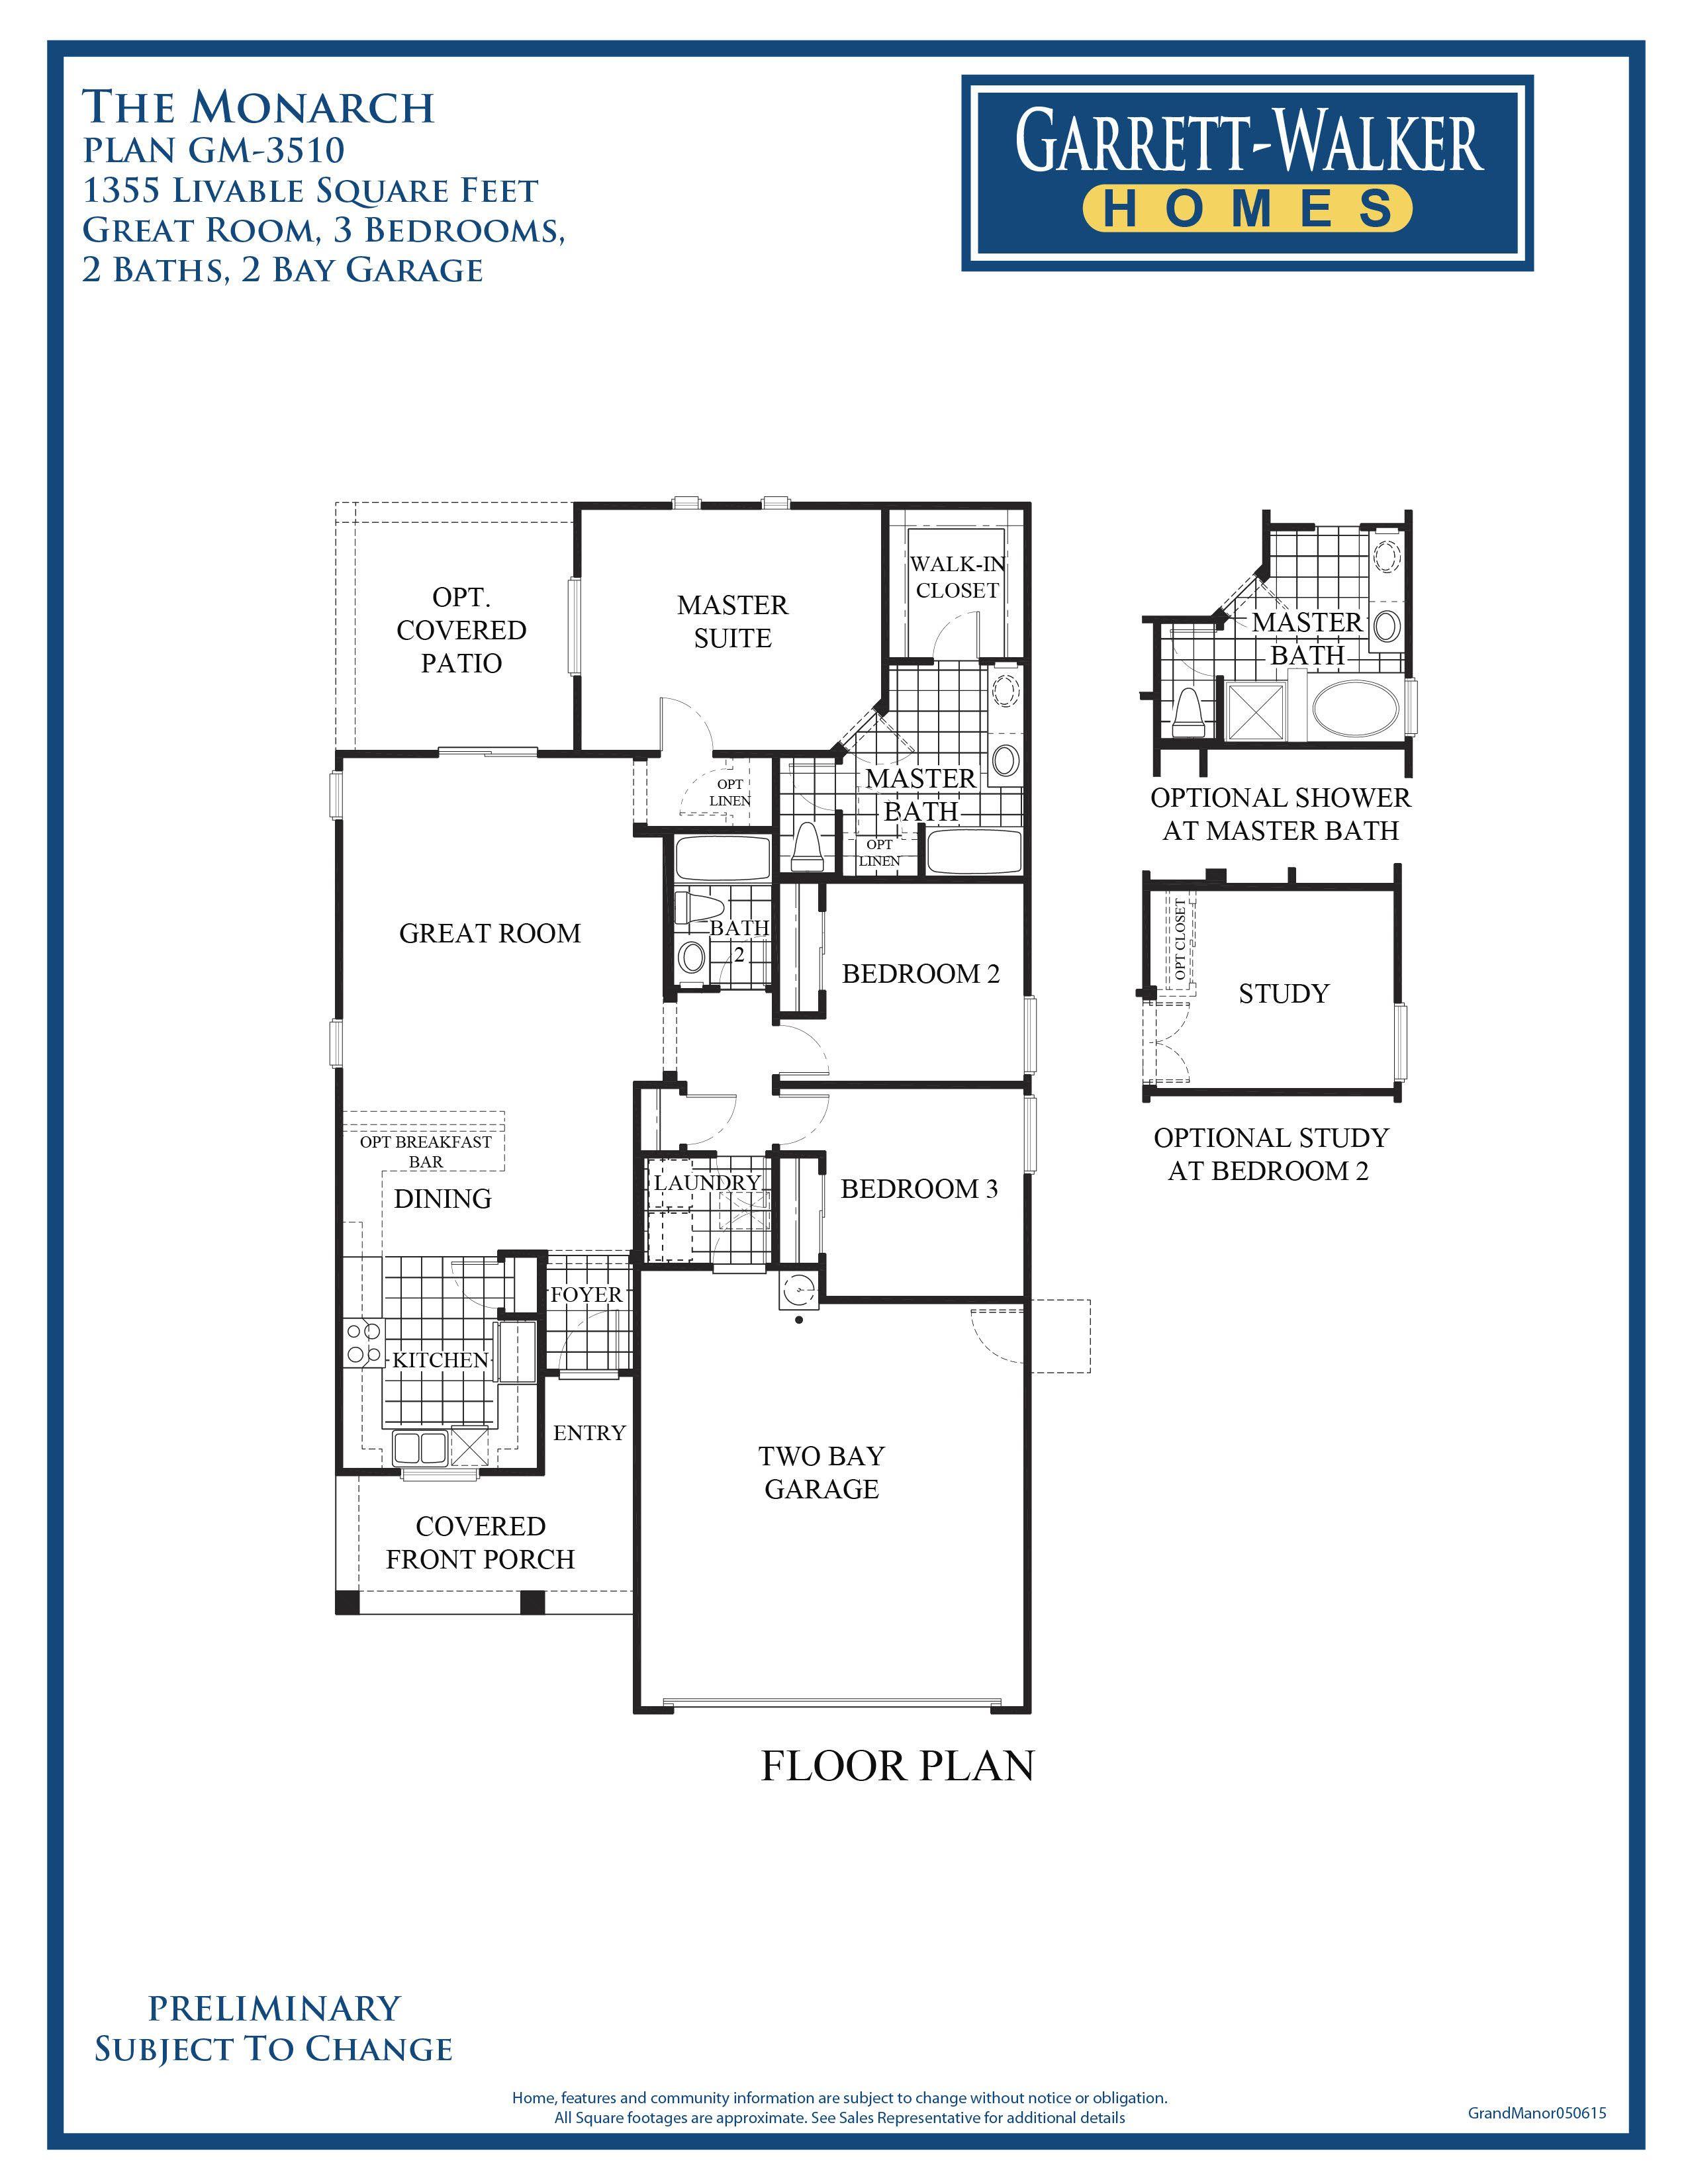 garrett walker homes harmony 21 community this floor plan shows